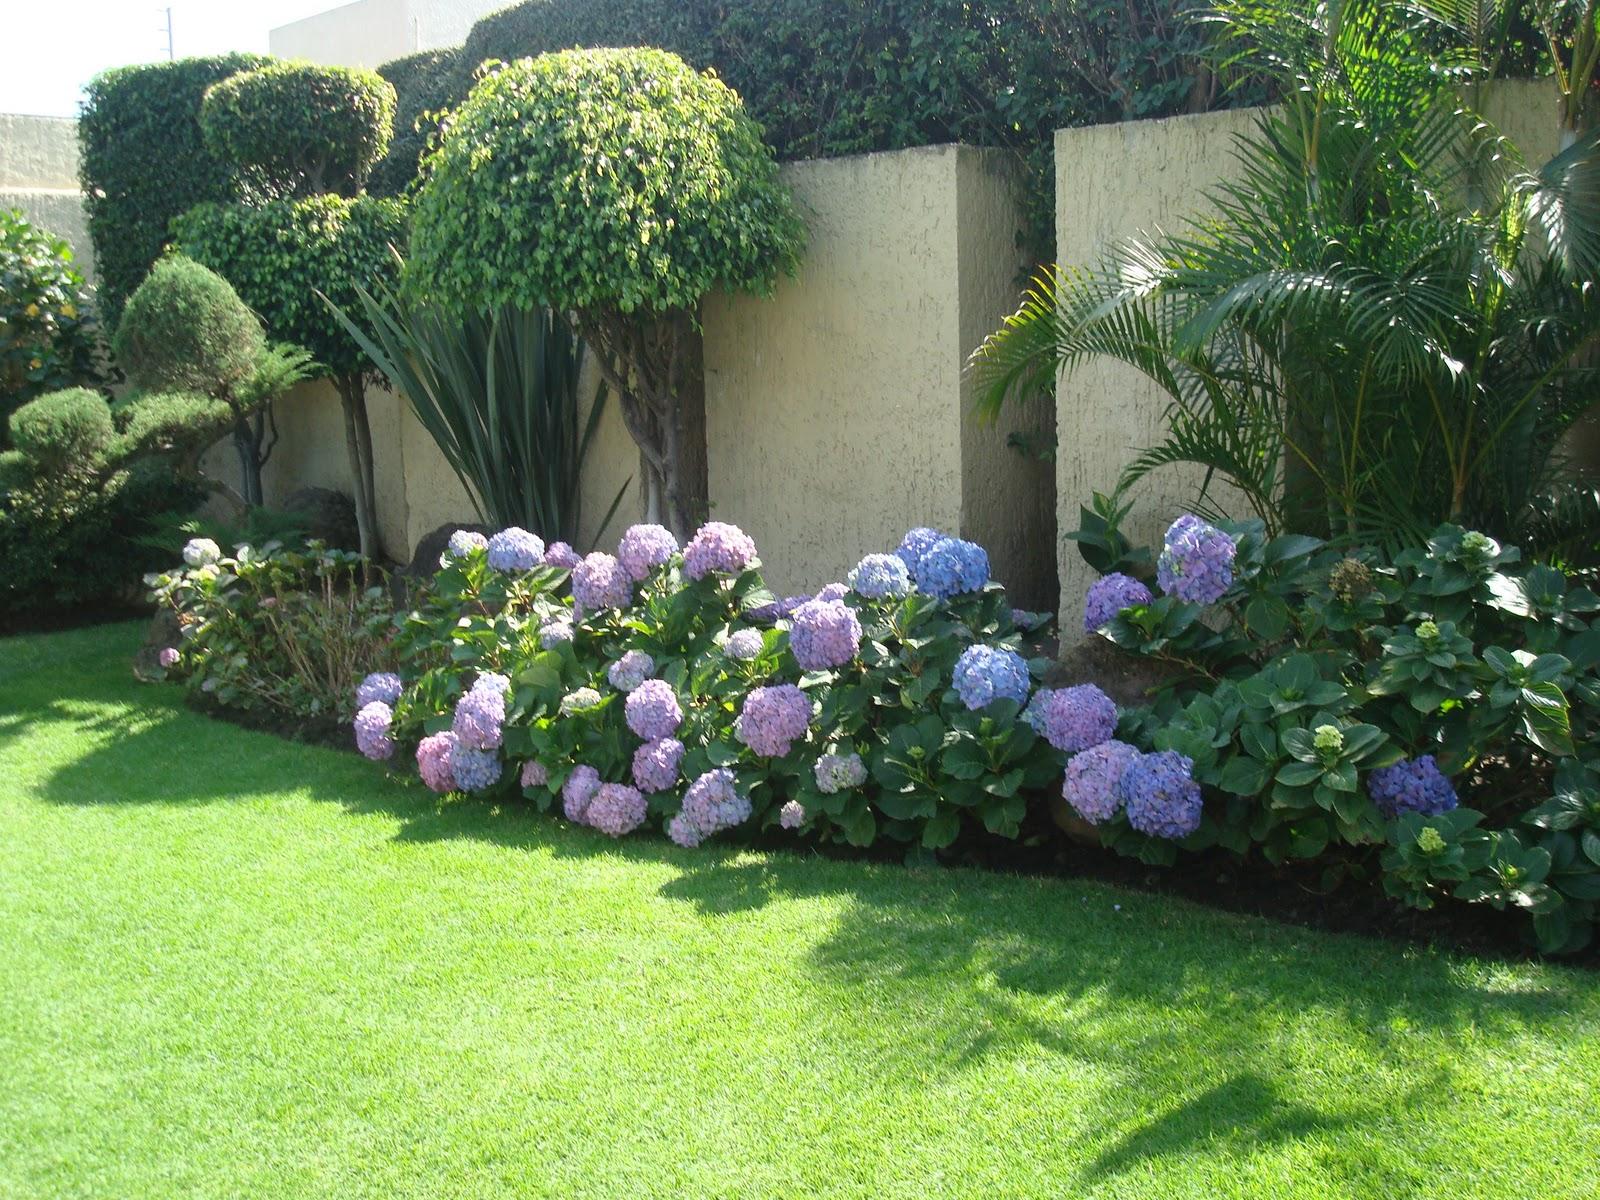 sancarlosfortin flores hortensias azules y jardin en av